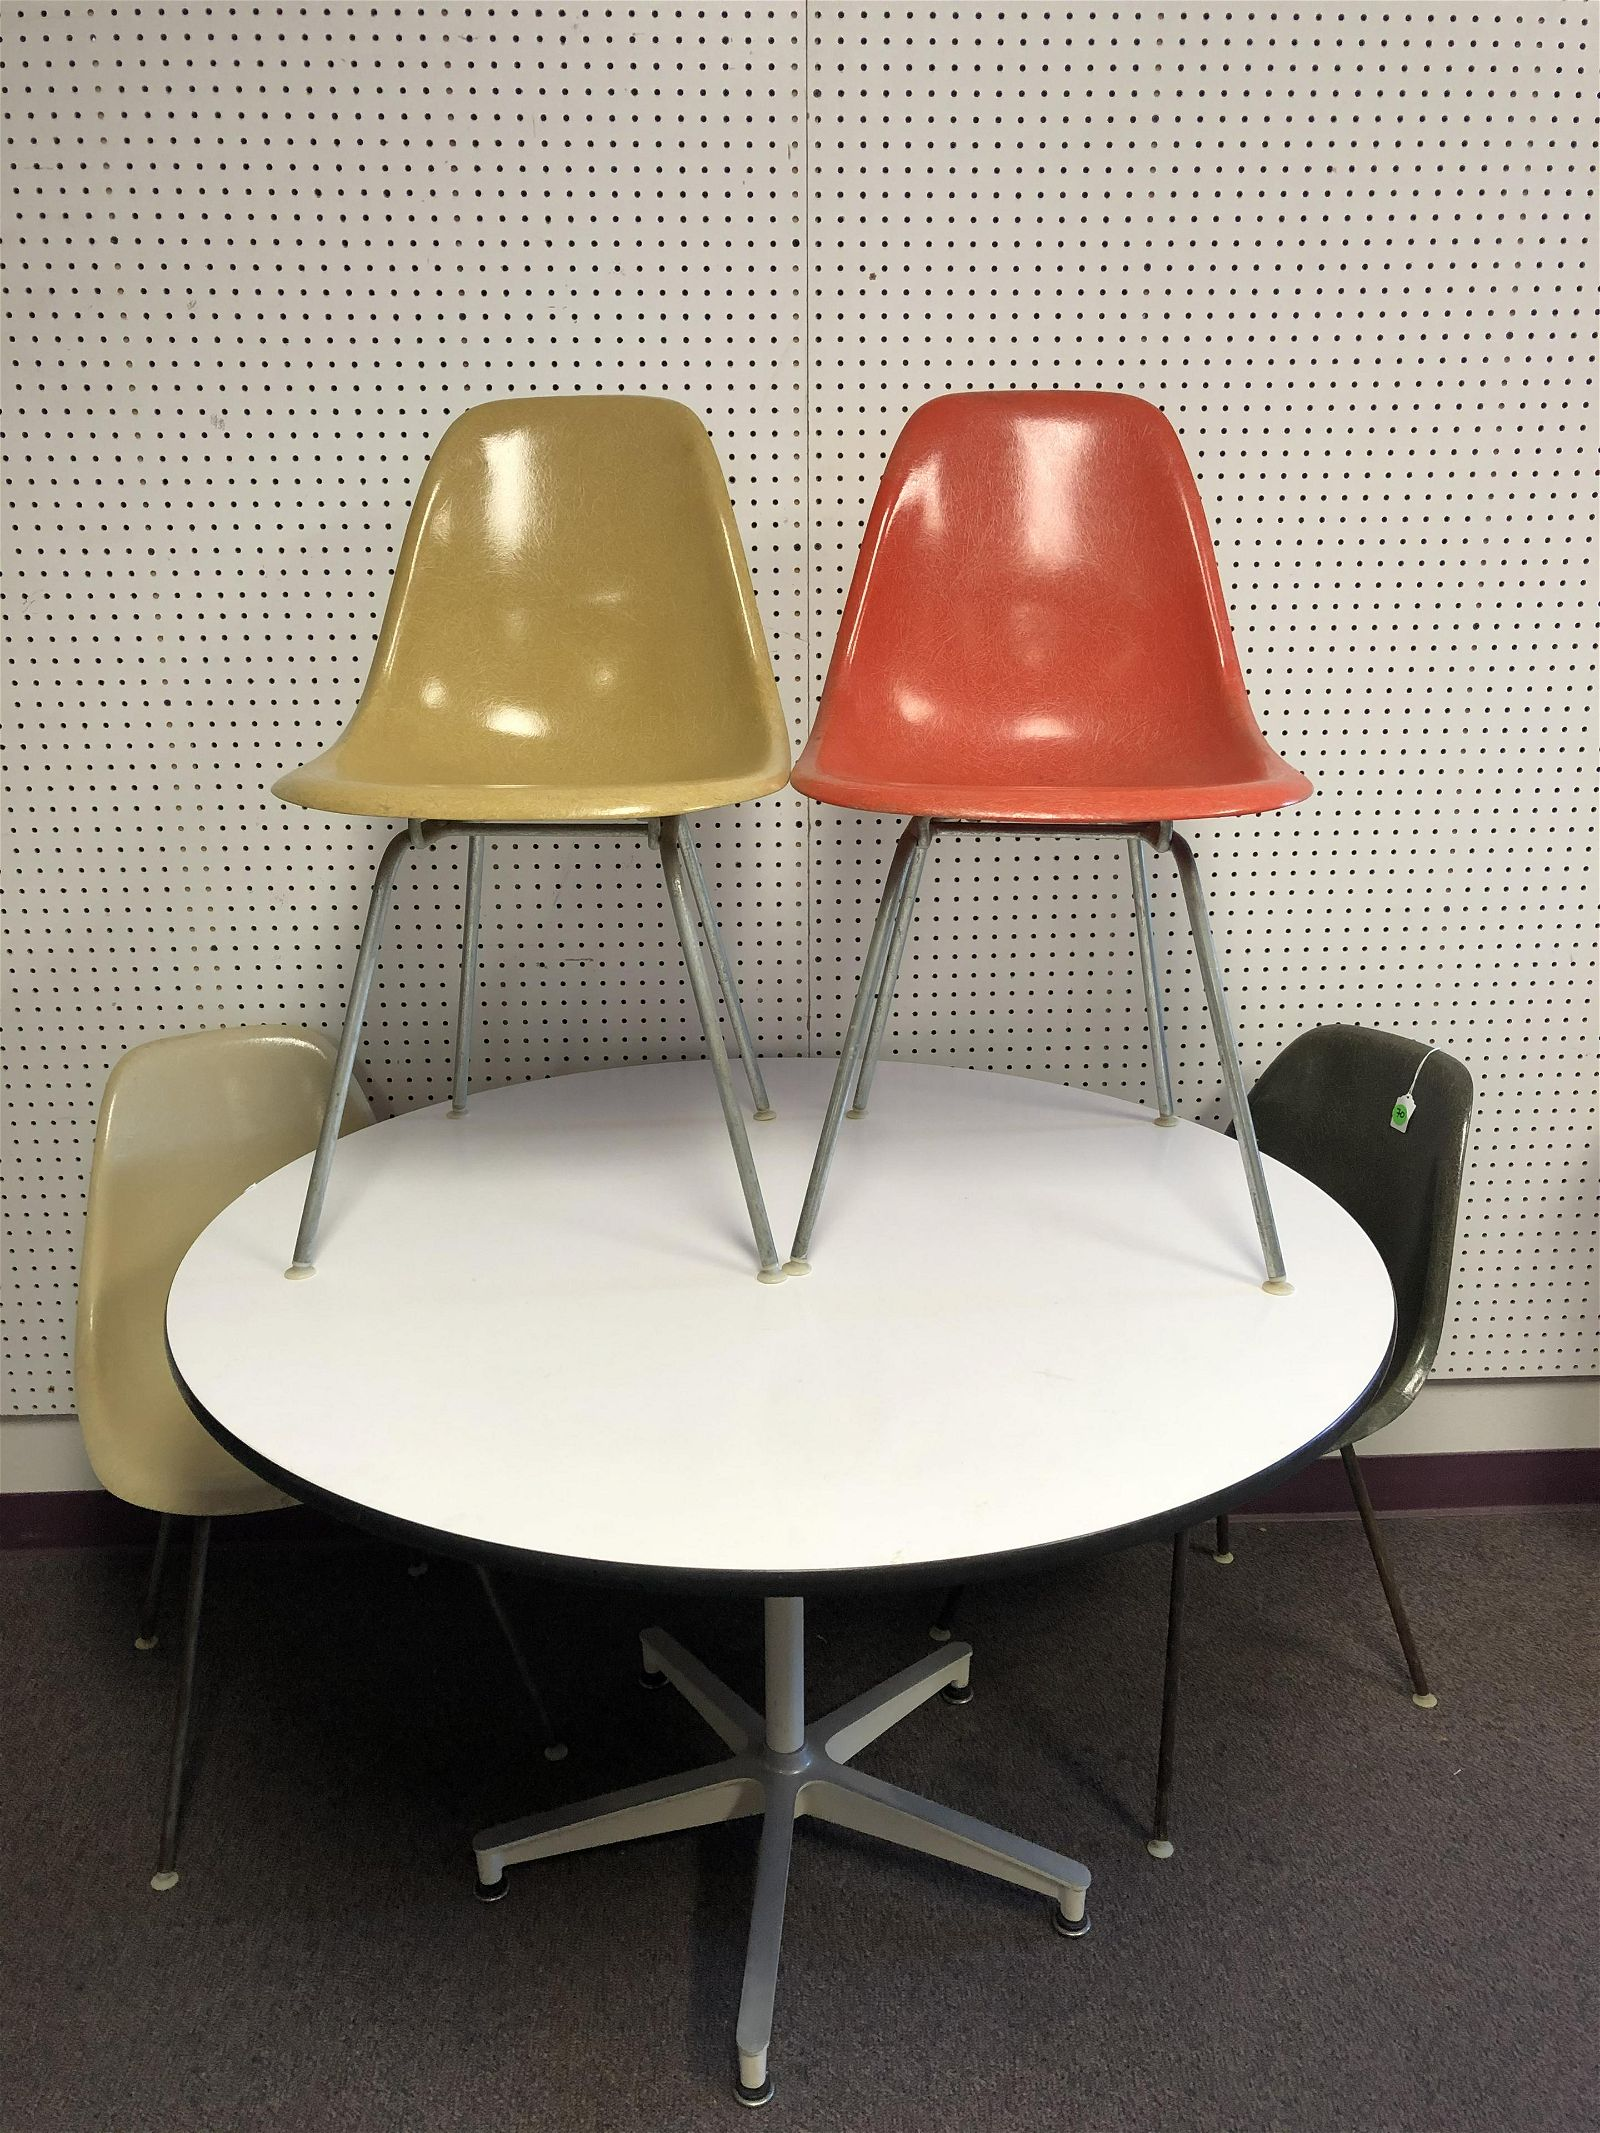 MCM Eames Herman Miller Table, Fiberglass Chairs -